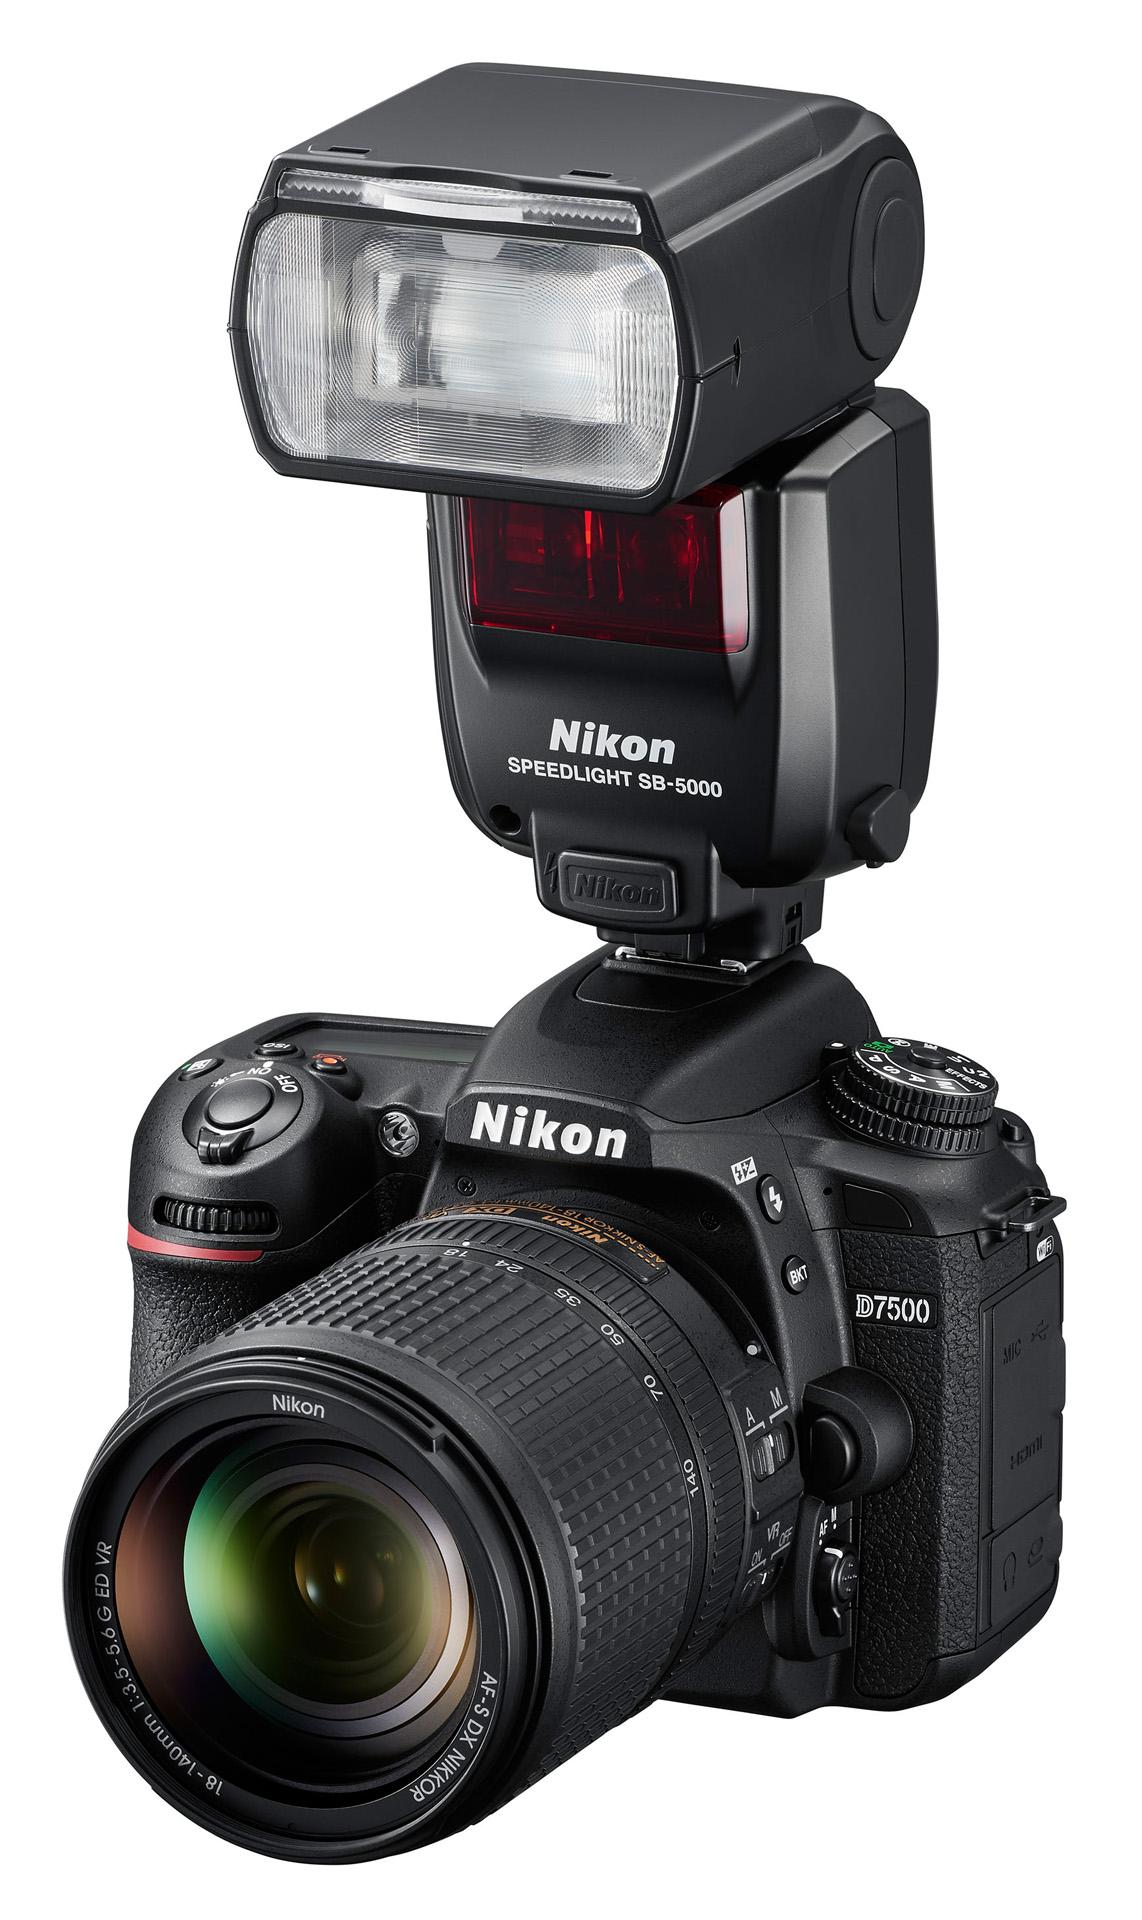 Nikon Speedlight SB-5000 na těle Nikonu D7500